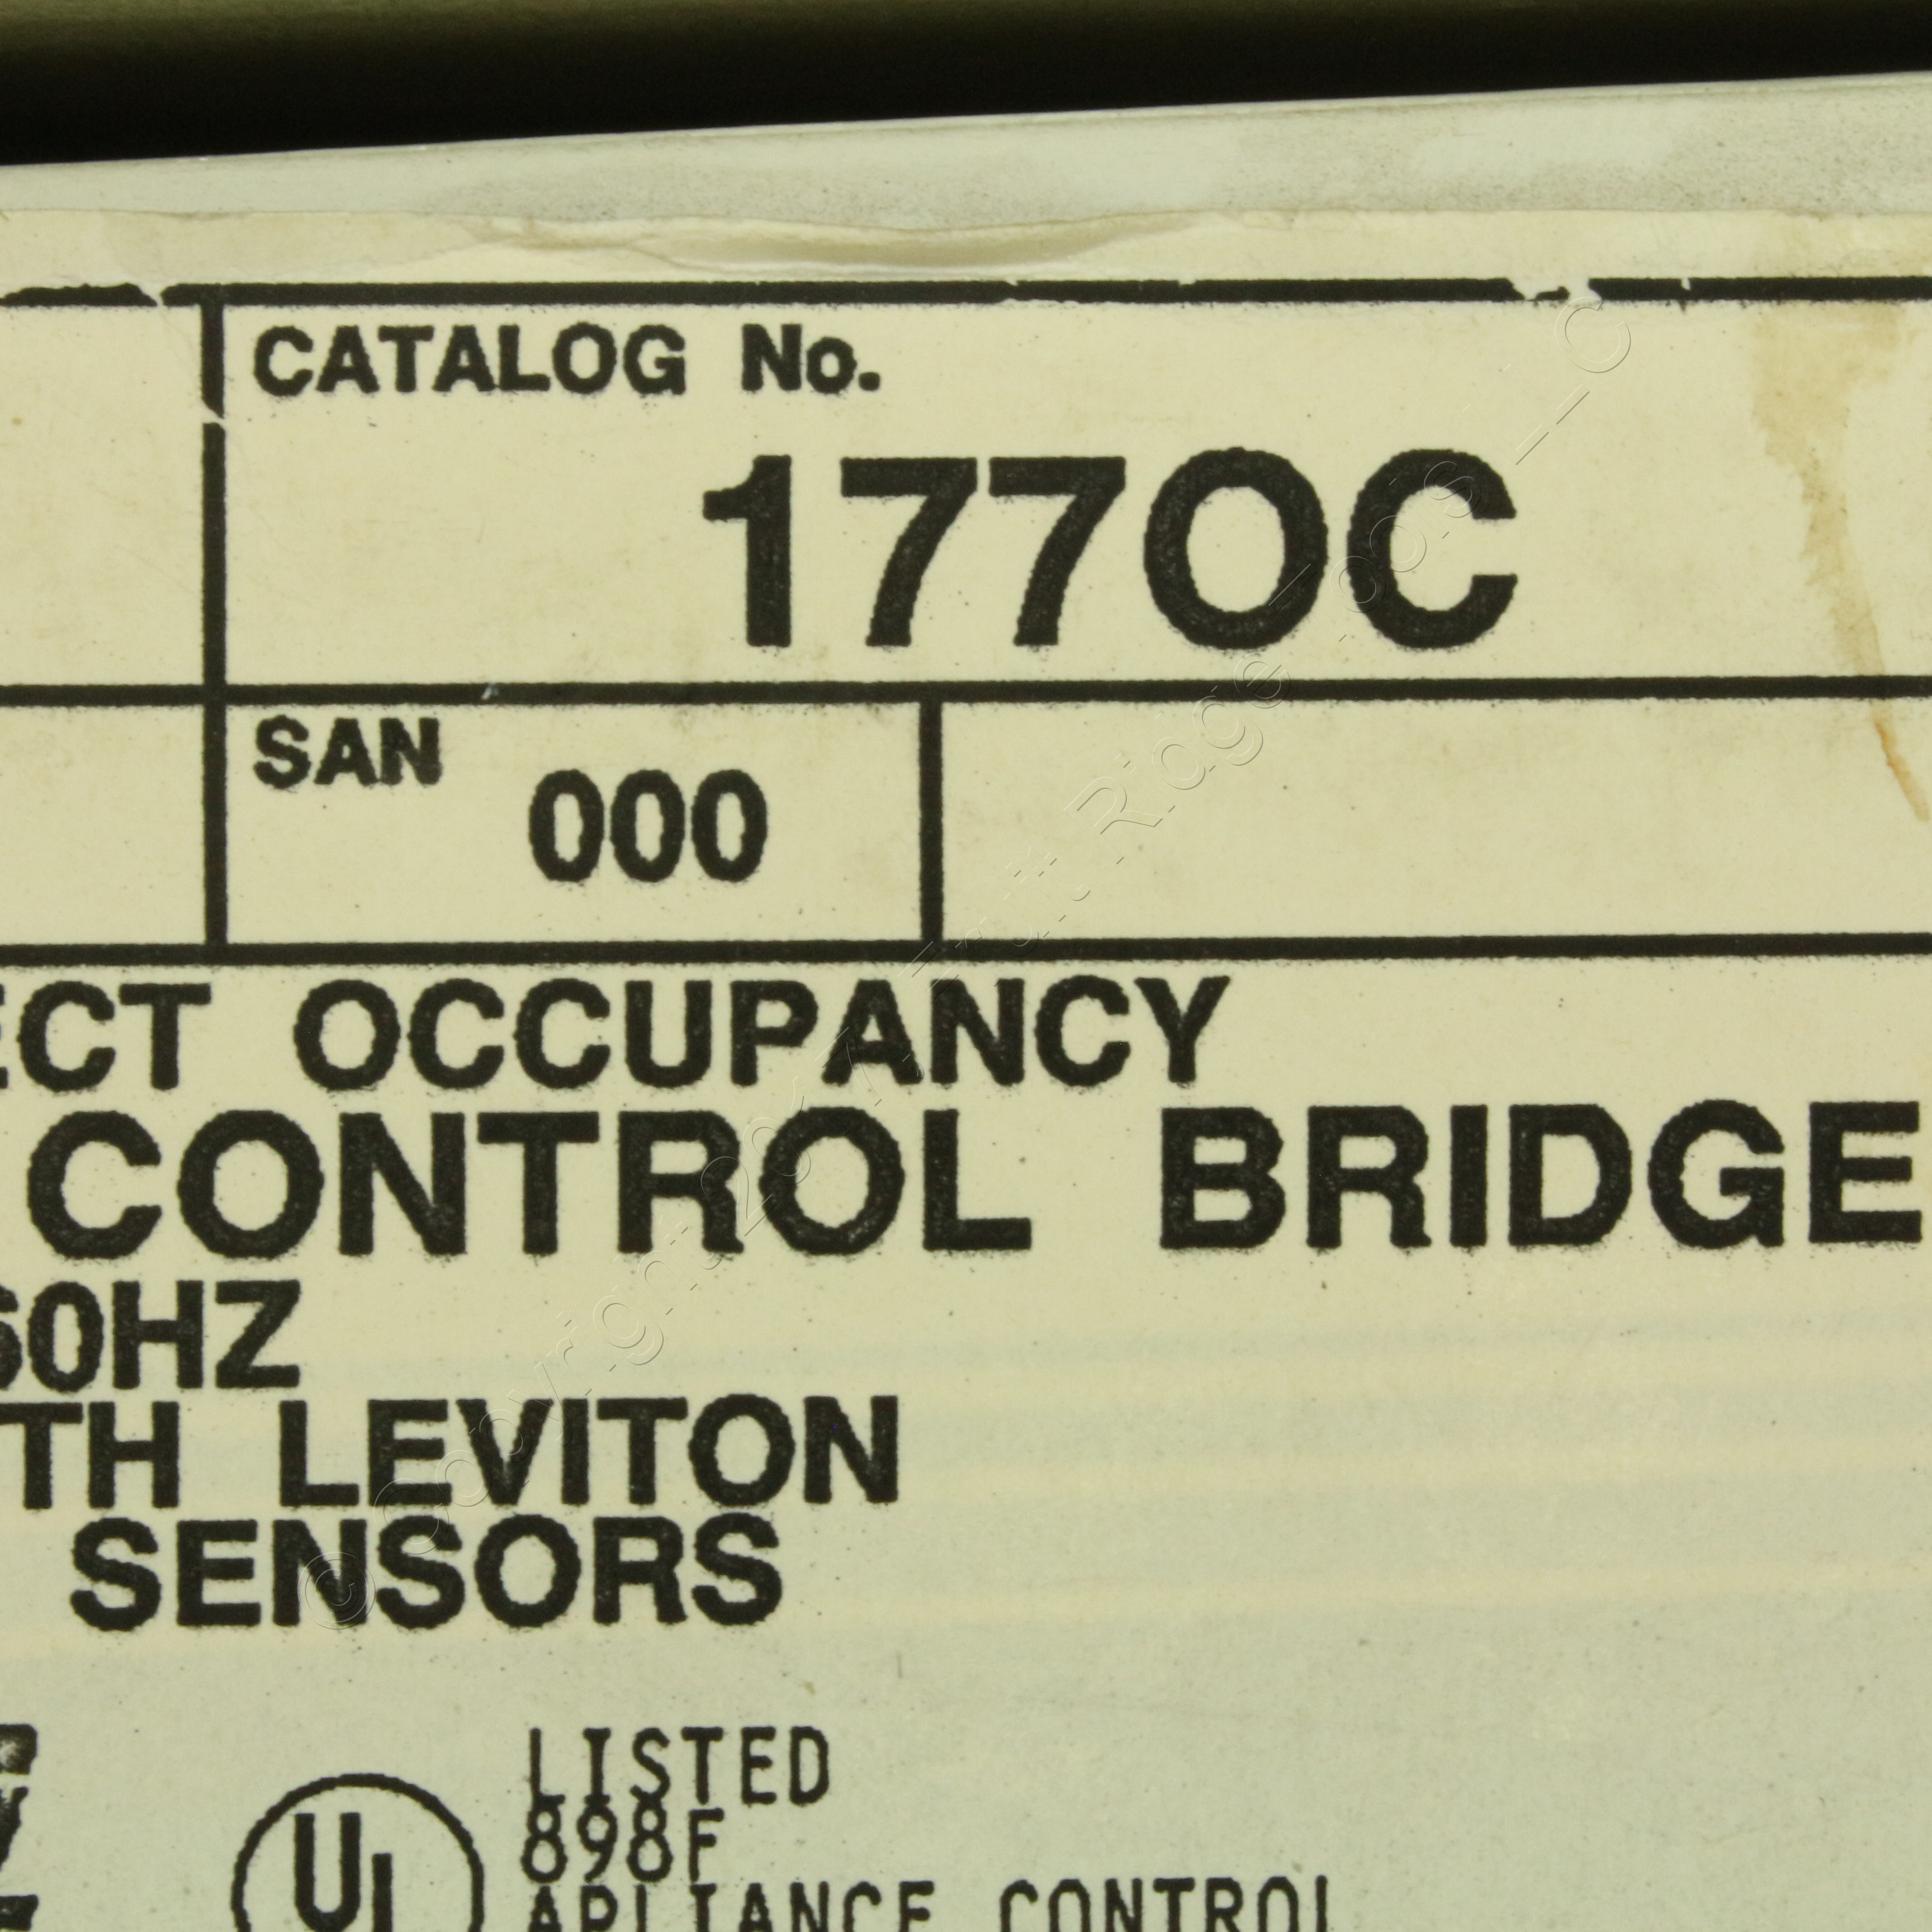 Leviton Scene Select Occupancy Motion Sensor Control Bridge No LOAD on